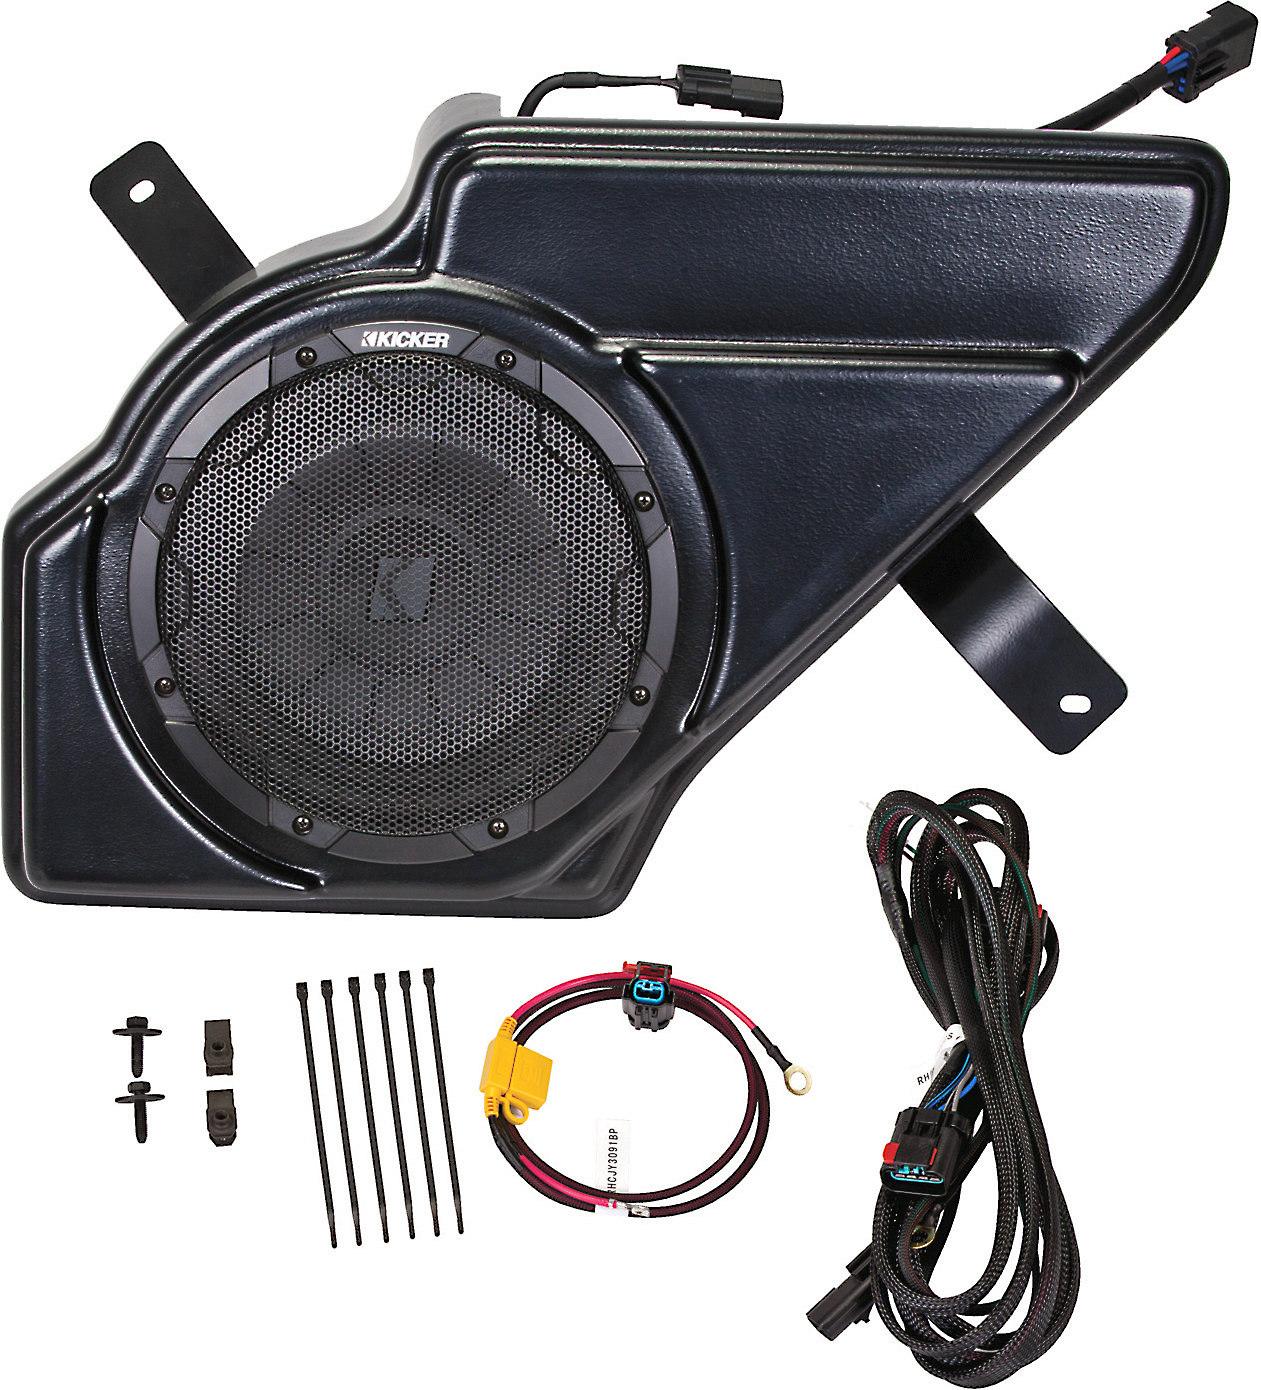 Kicker VSS™ PowerStage System